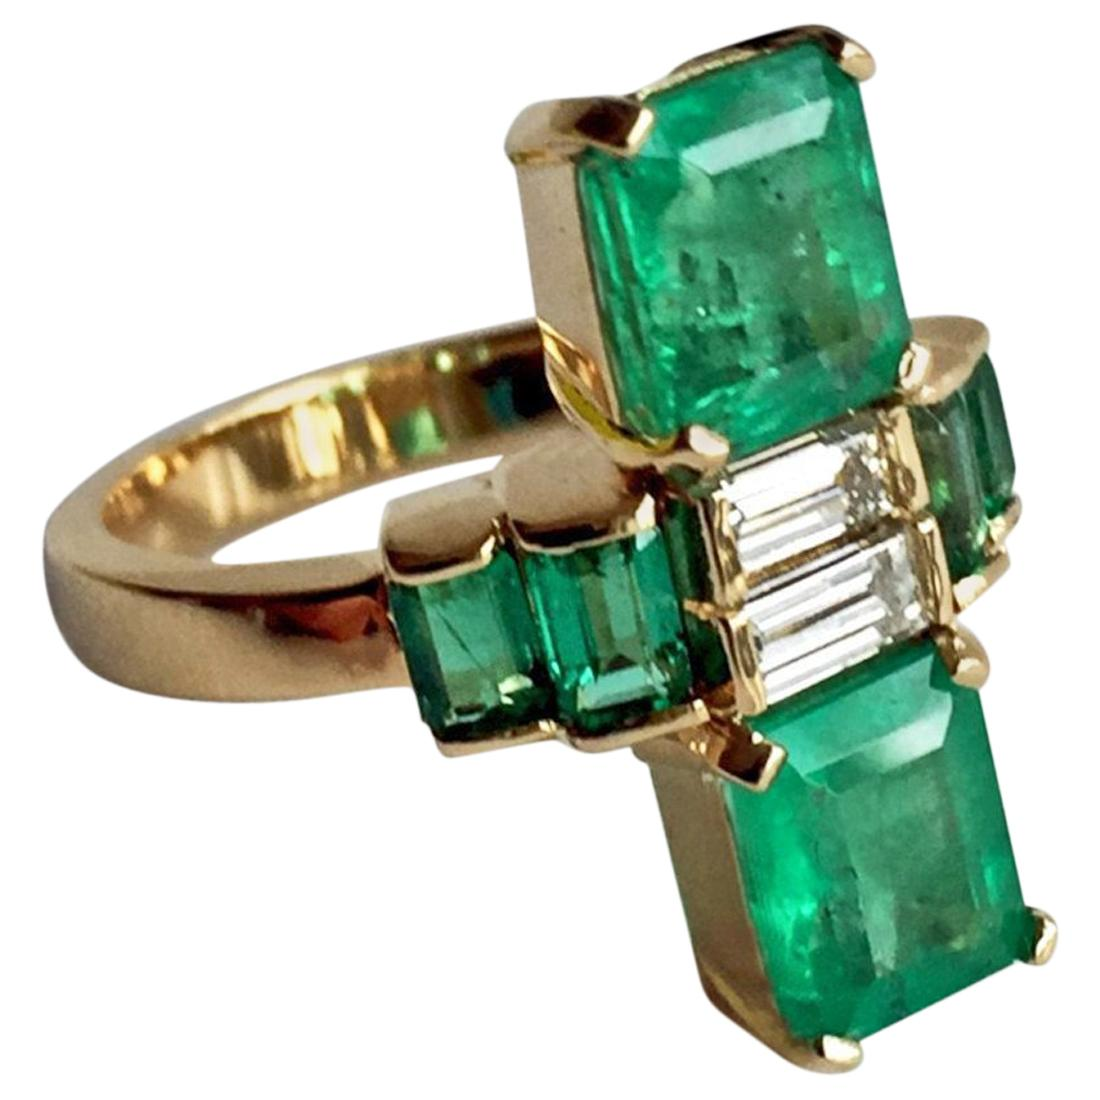 4.24 Carat Fine Colombian Emerald Diamond Art Deco Style Ring 18K